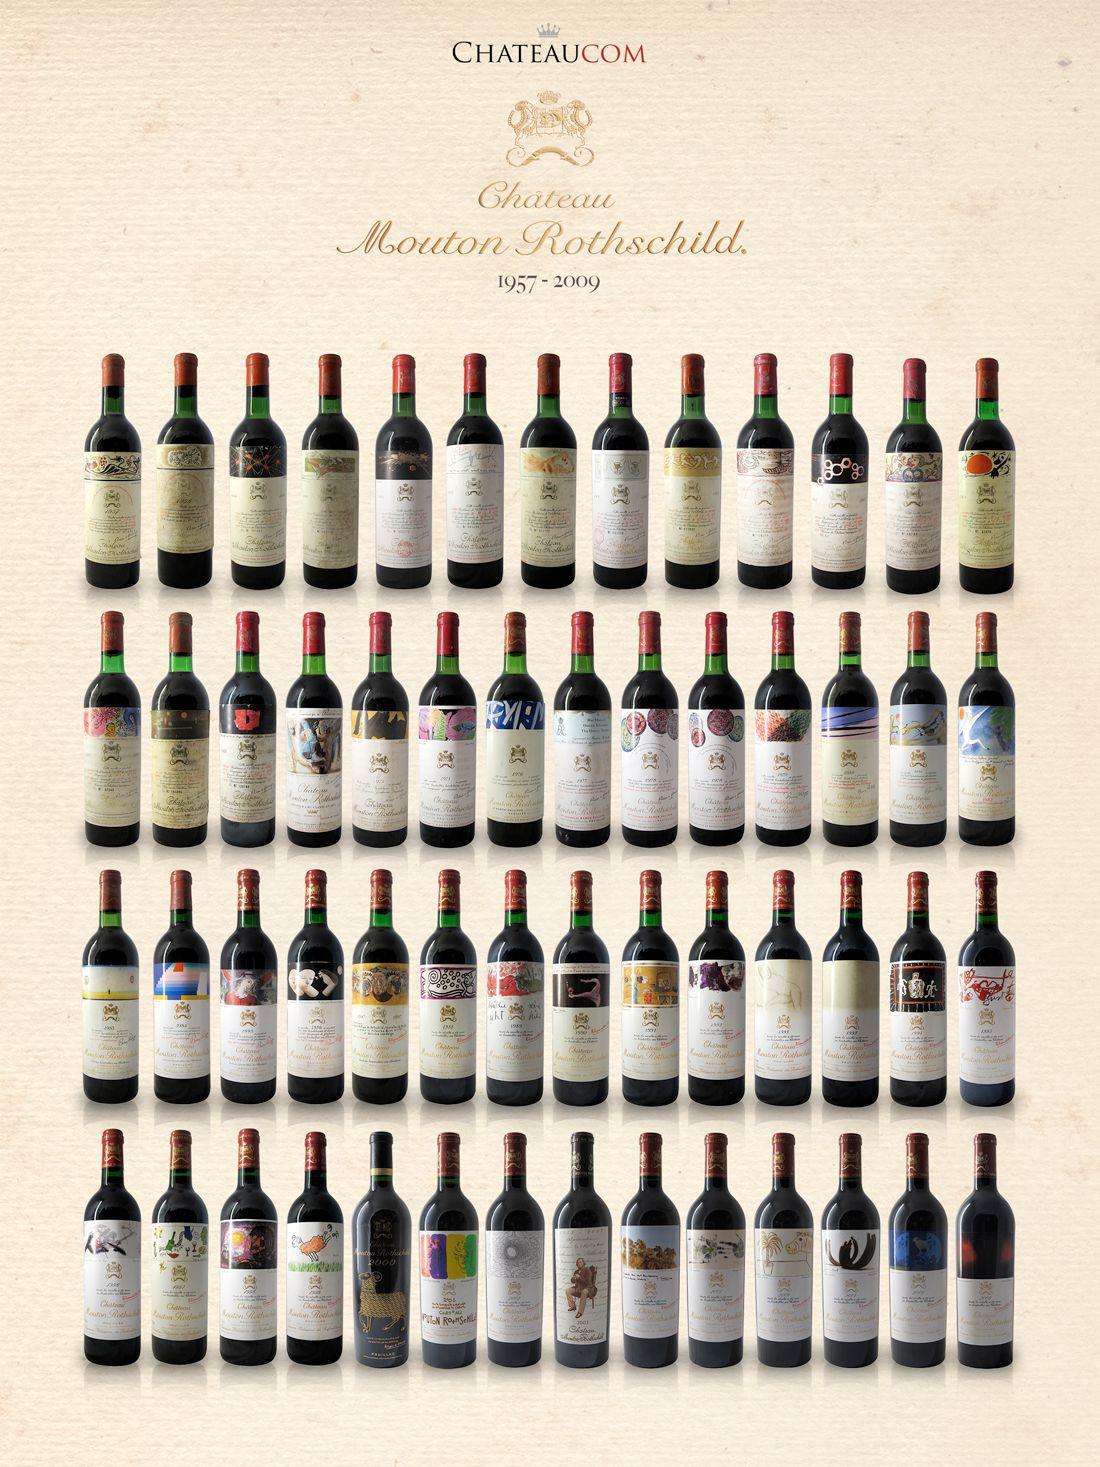 Collection Château Mouton Rothschild 1957-2009